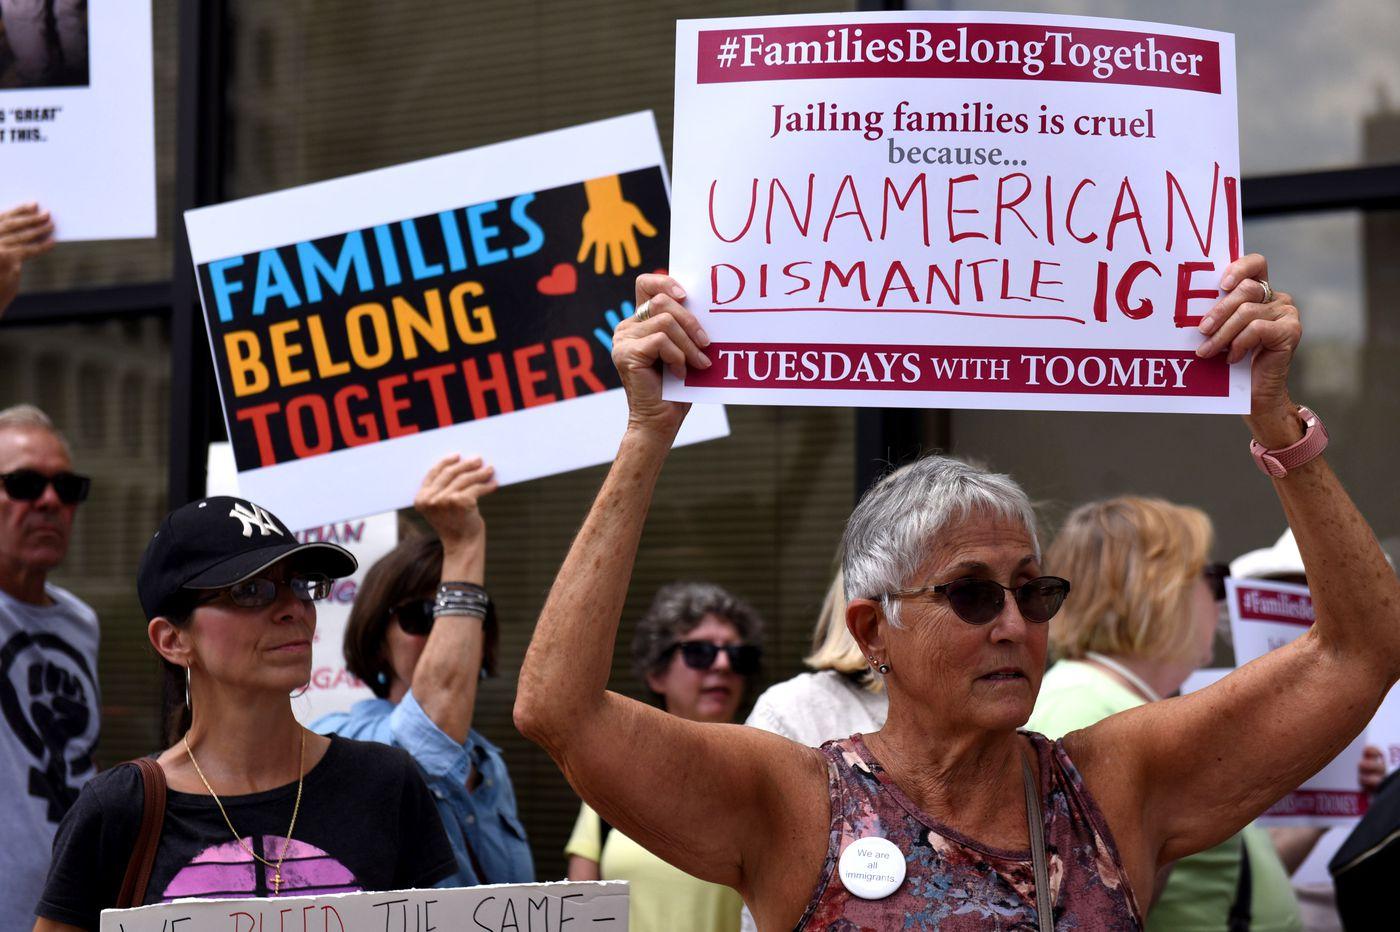 Berks family detention center: A model for jailing migrant families?